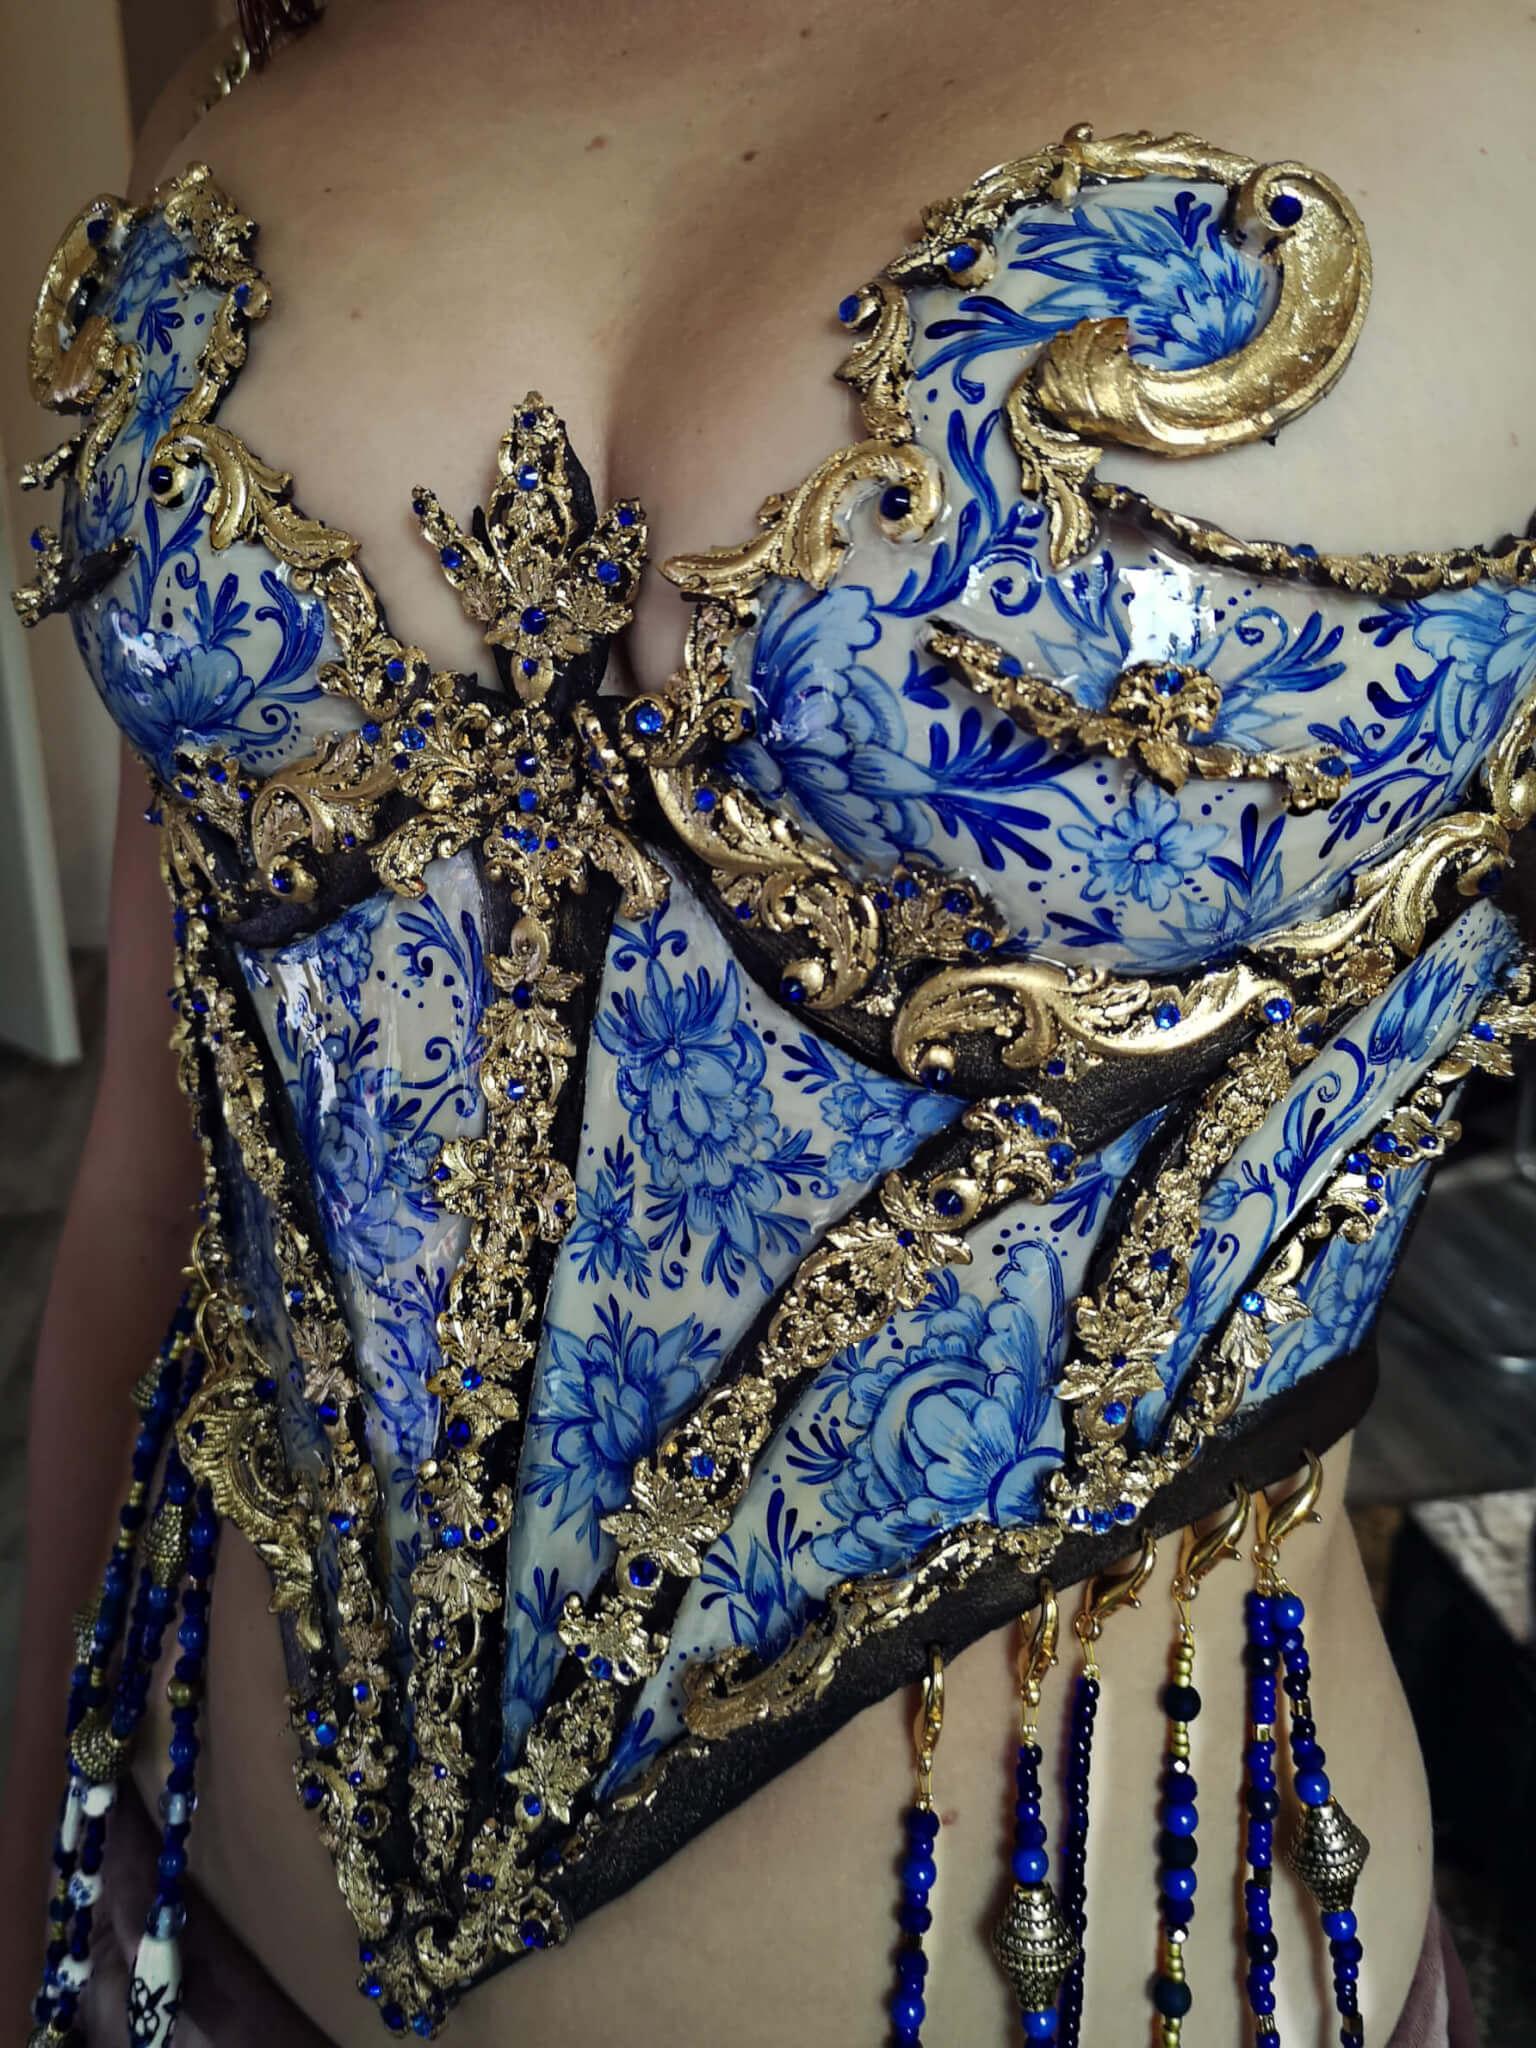 delft blue porcelain corset by joyce spakman, candy makeup artist